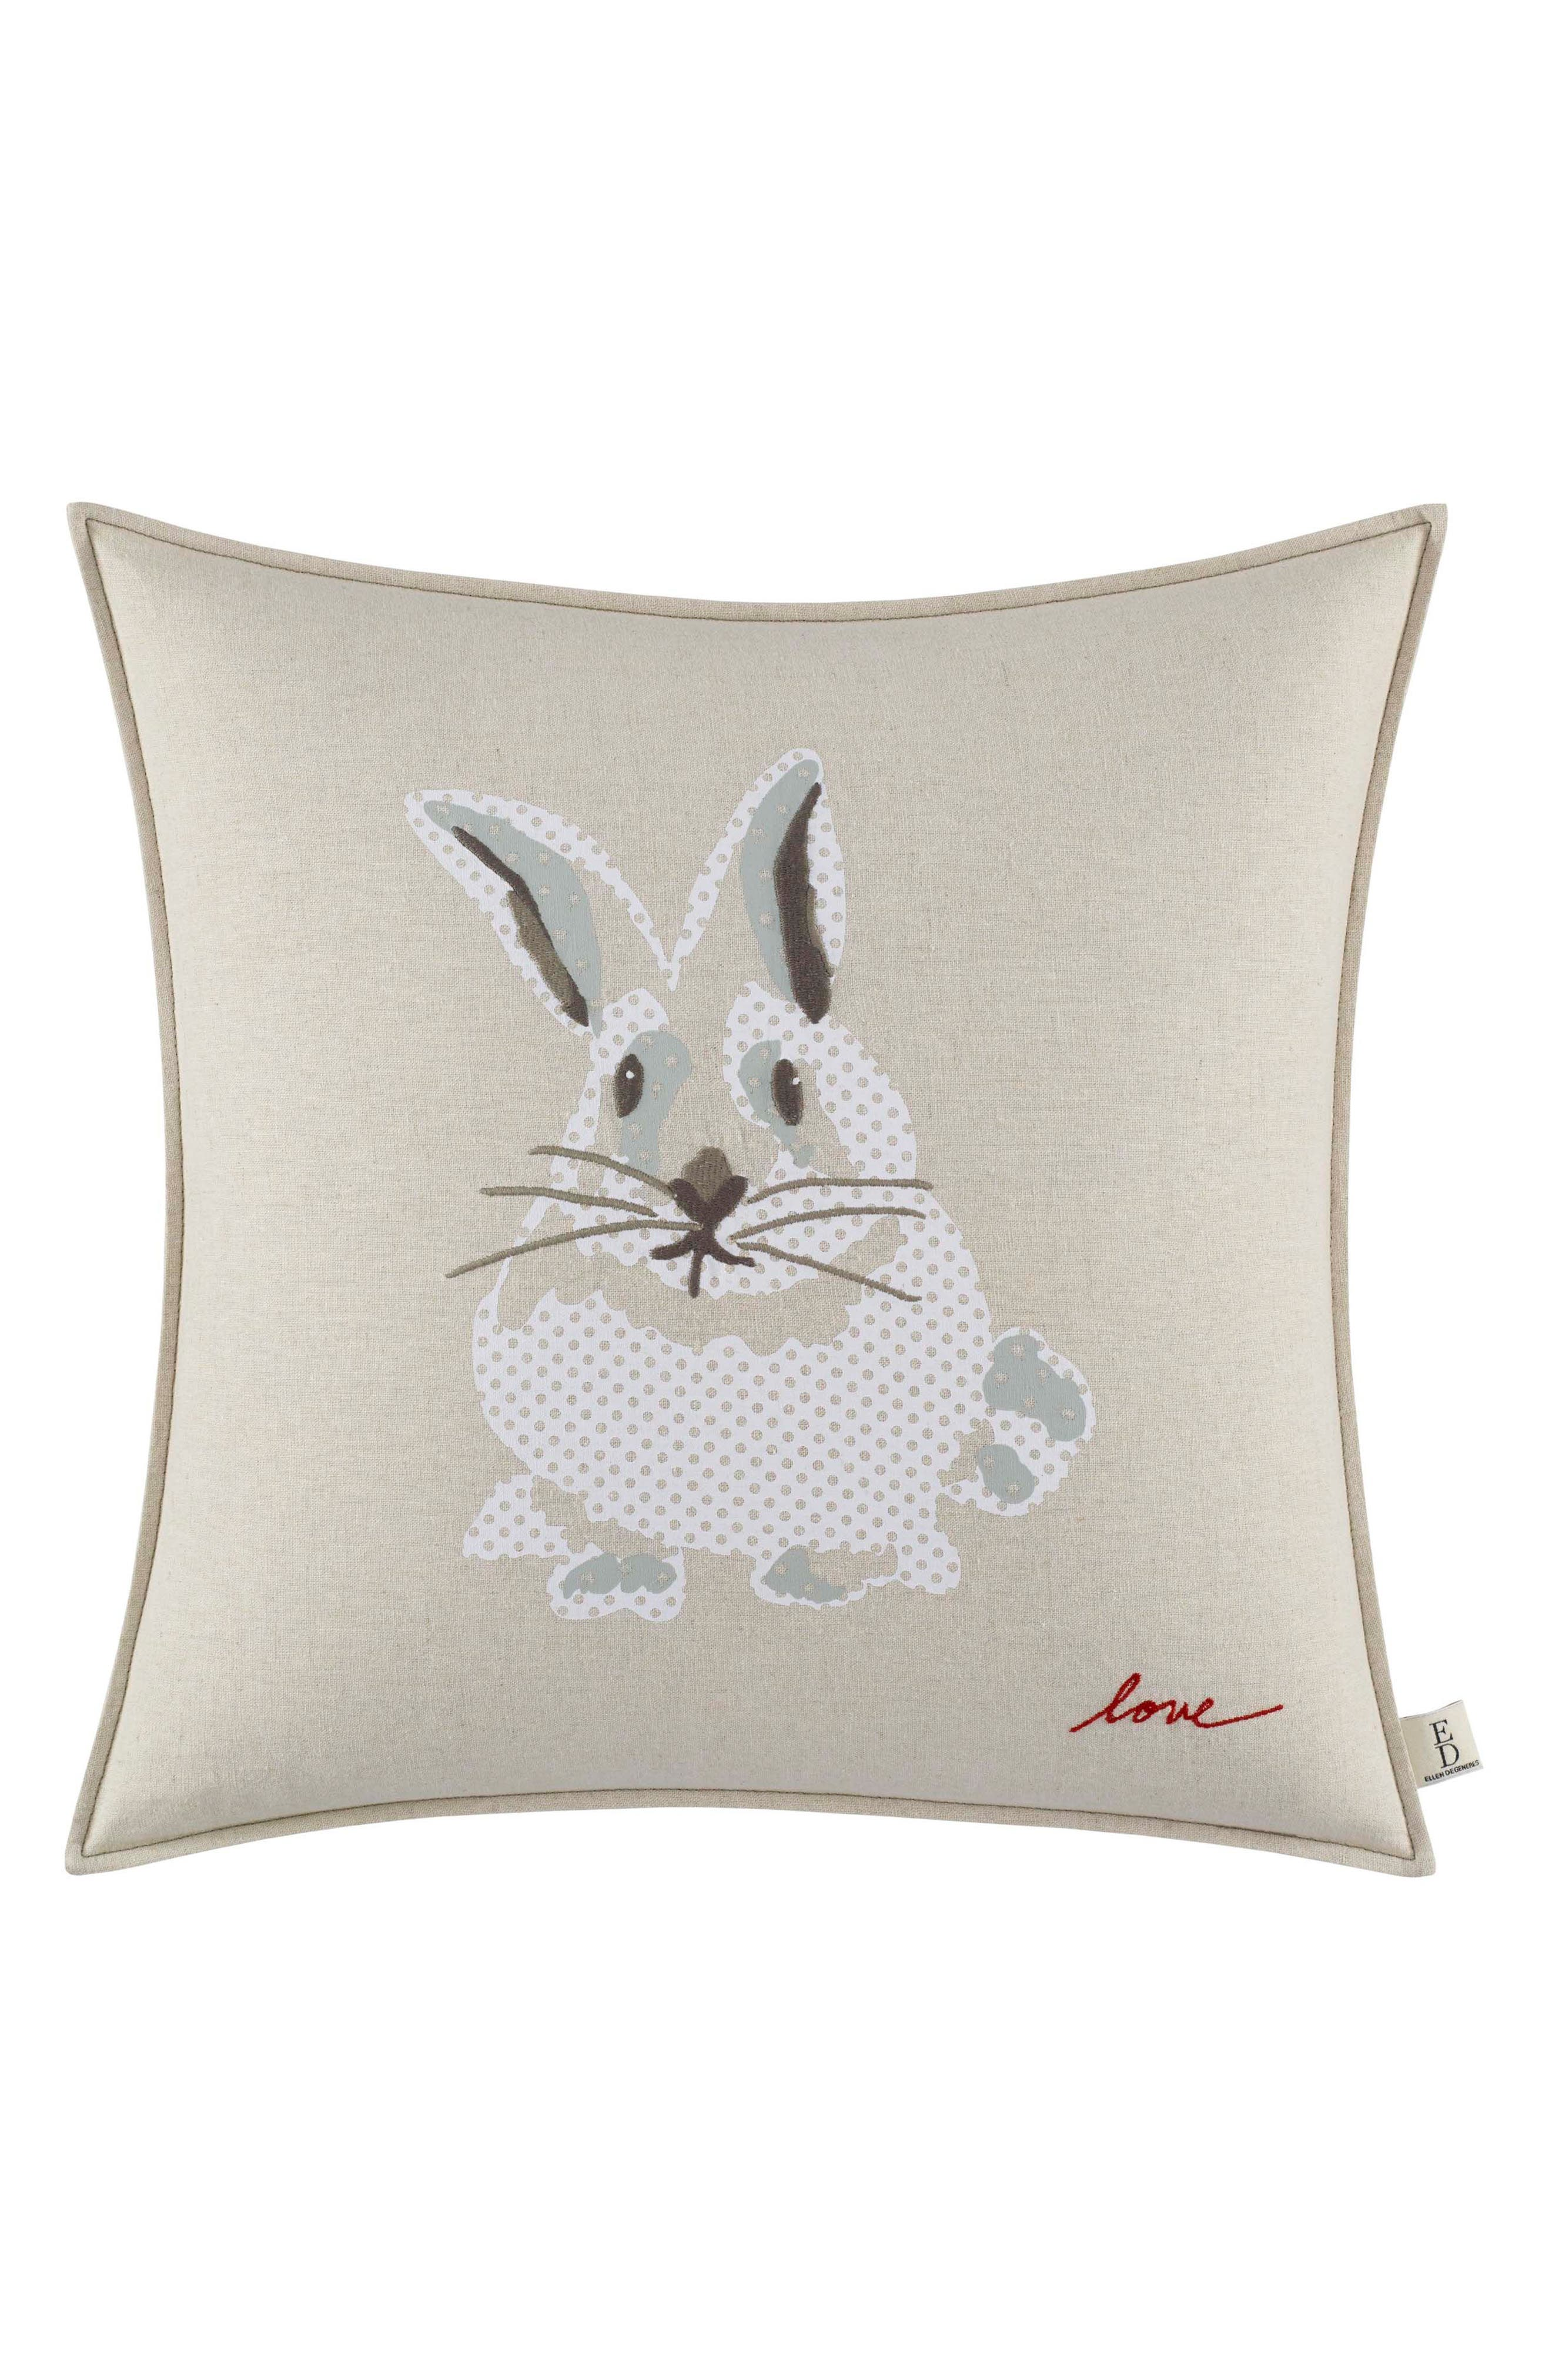 Bunny Pillow,                             Main thumbnail 1, color,                             BEIGE